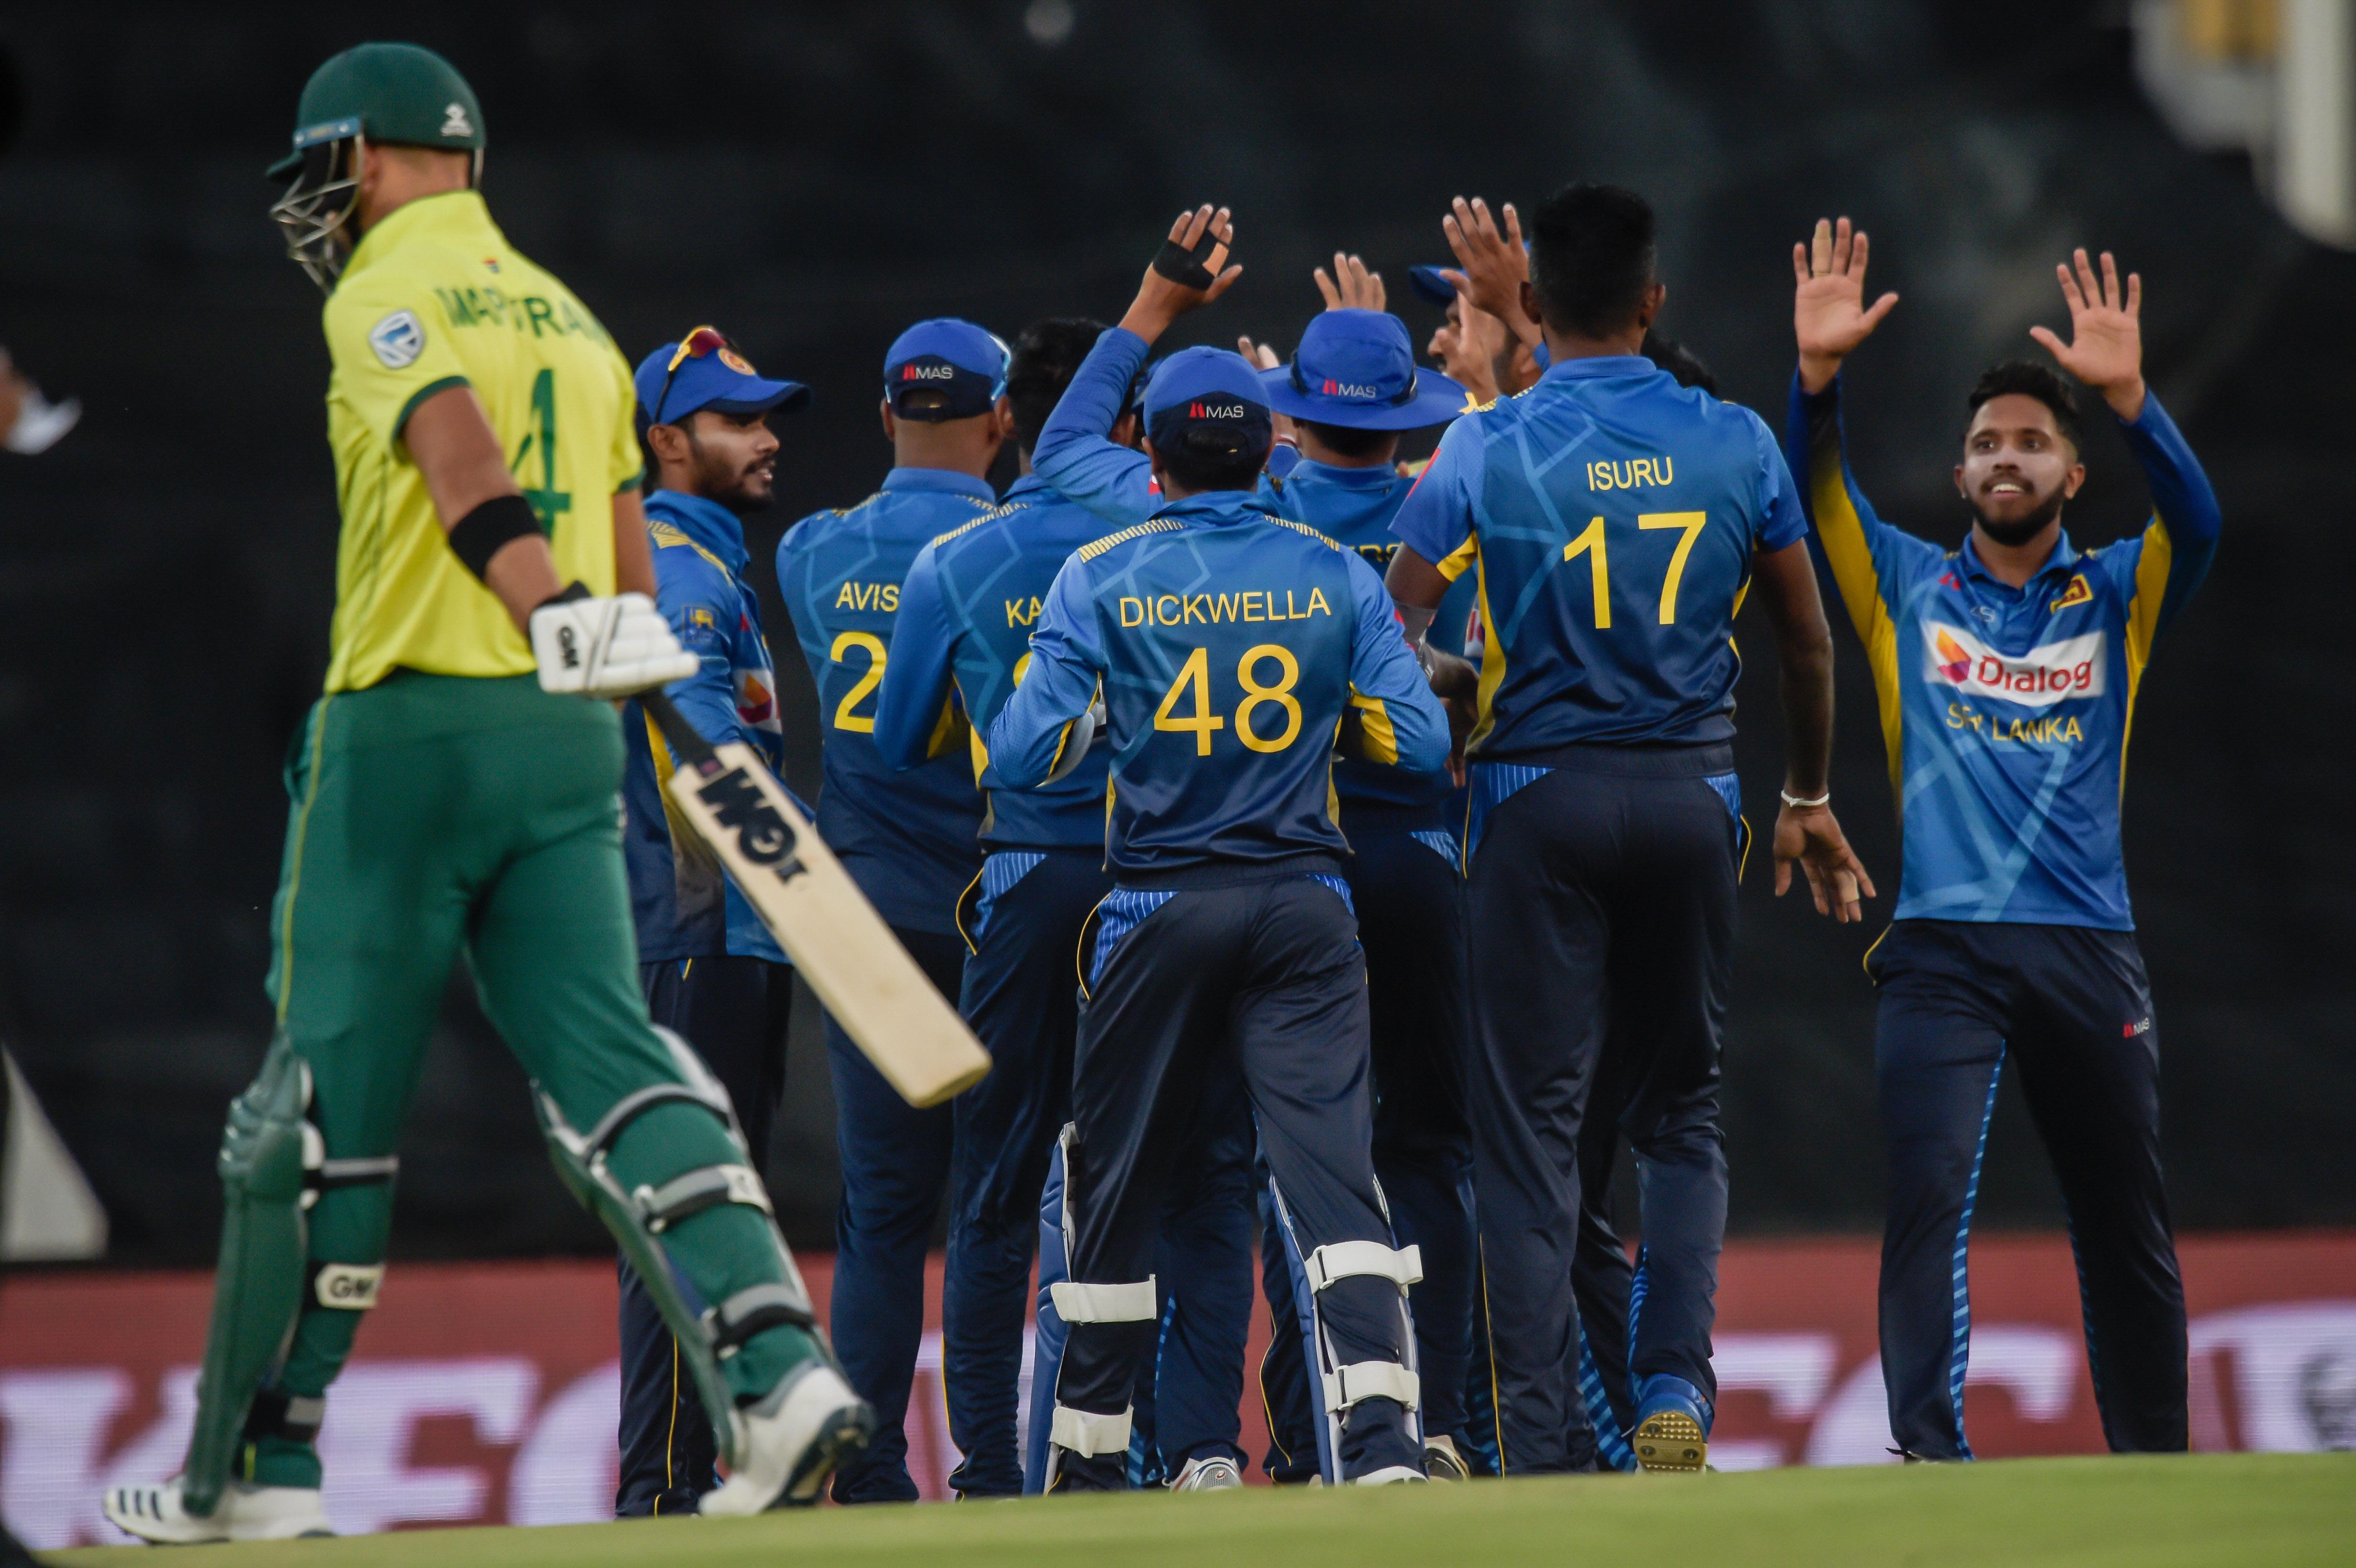 www.icc-cricket.com